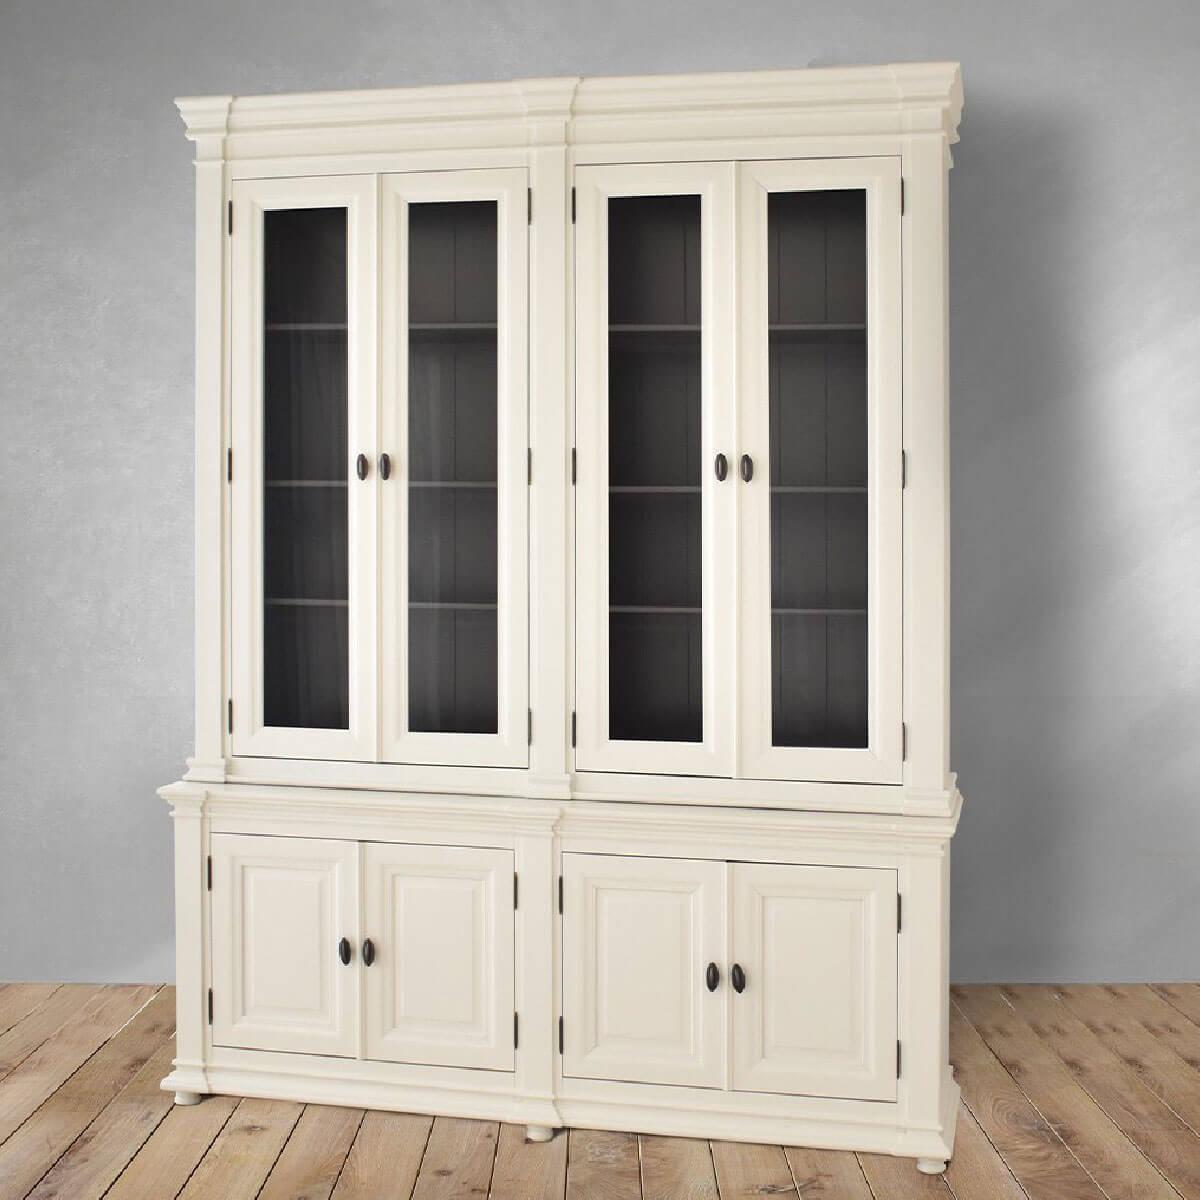 Eleanor-4-Door-cabinet-Cozy-Home-Dubai